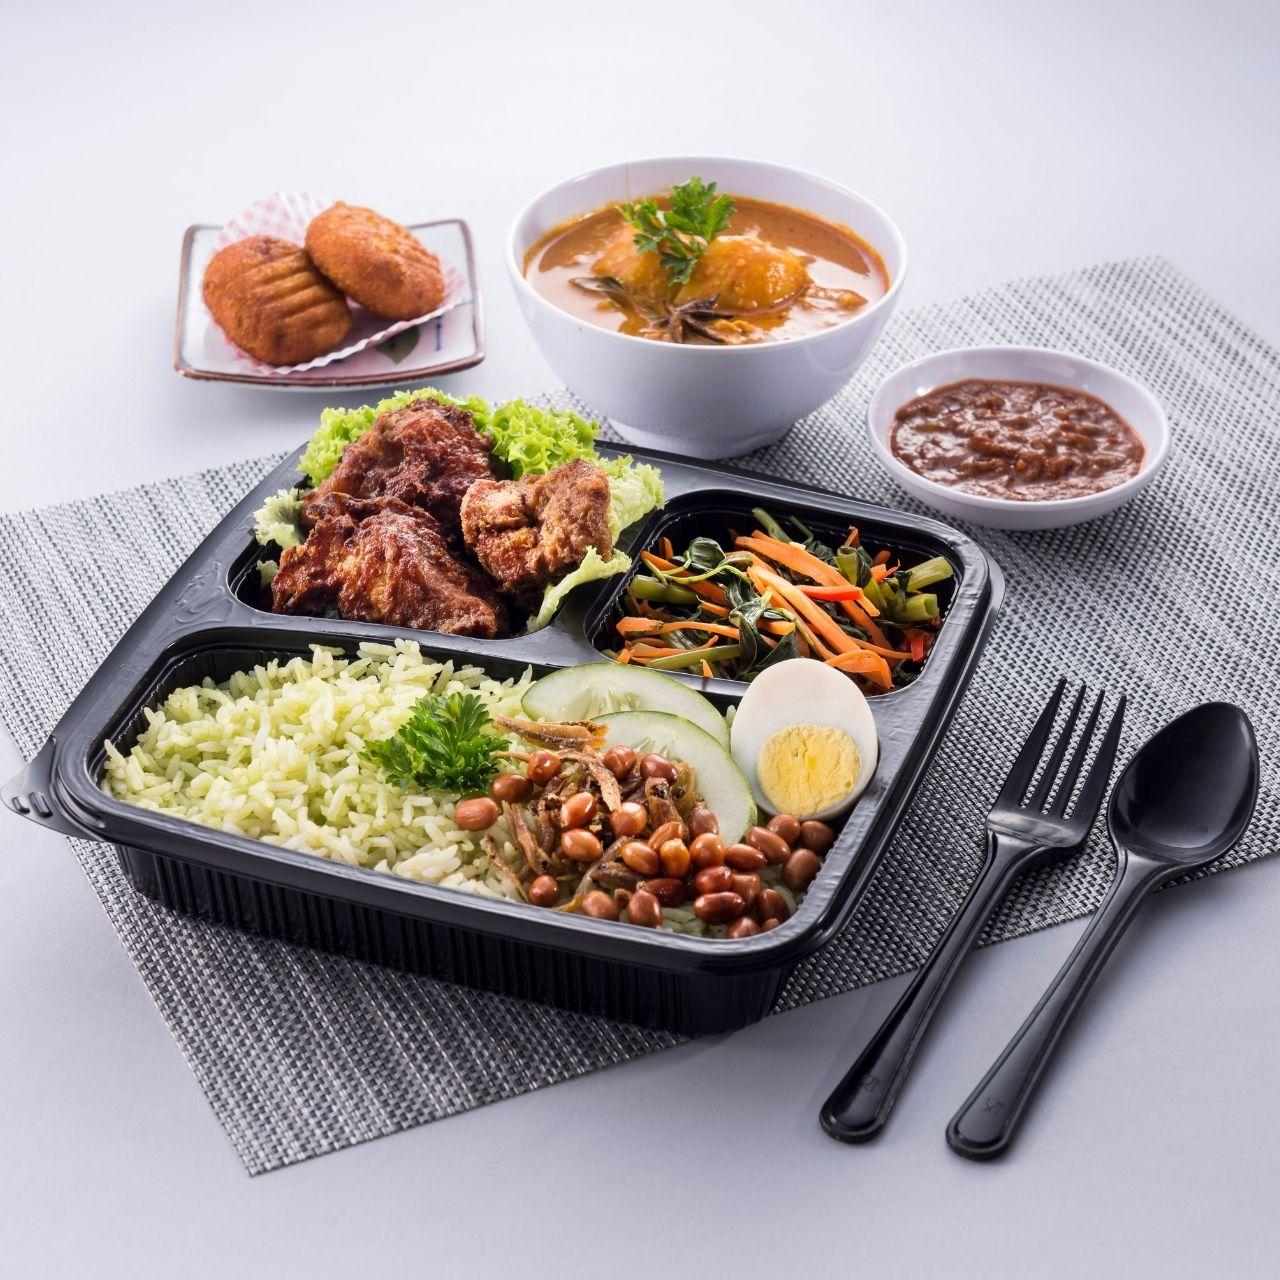 runningmen catering bento box nasi lemak pandan with ayam berempah